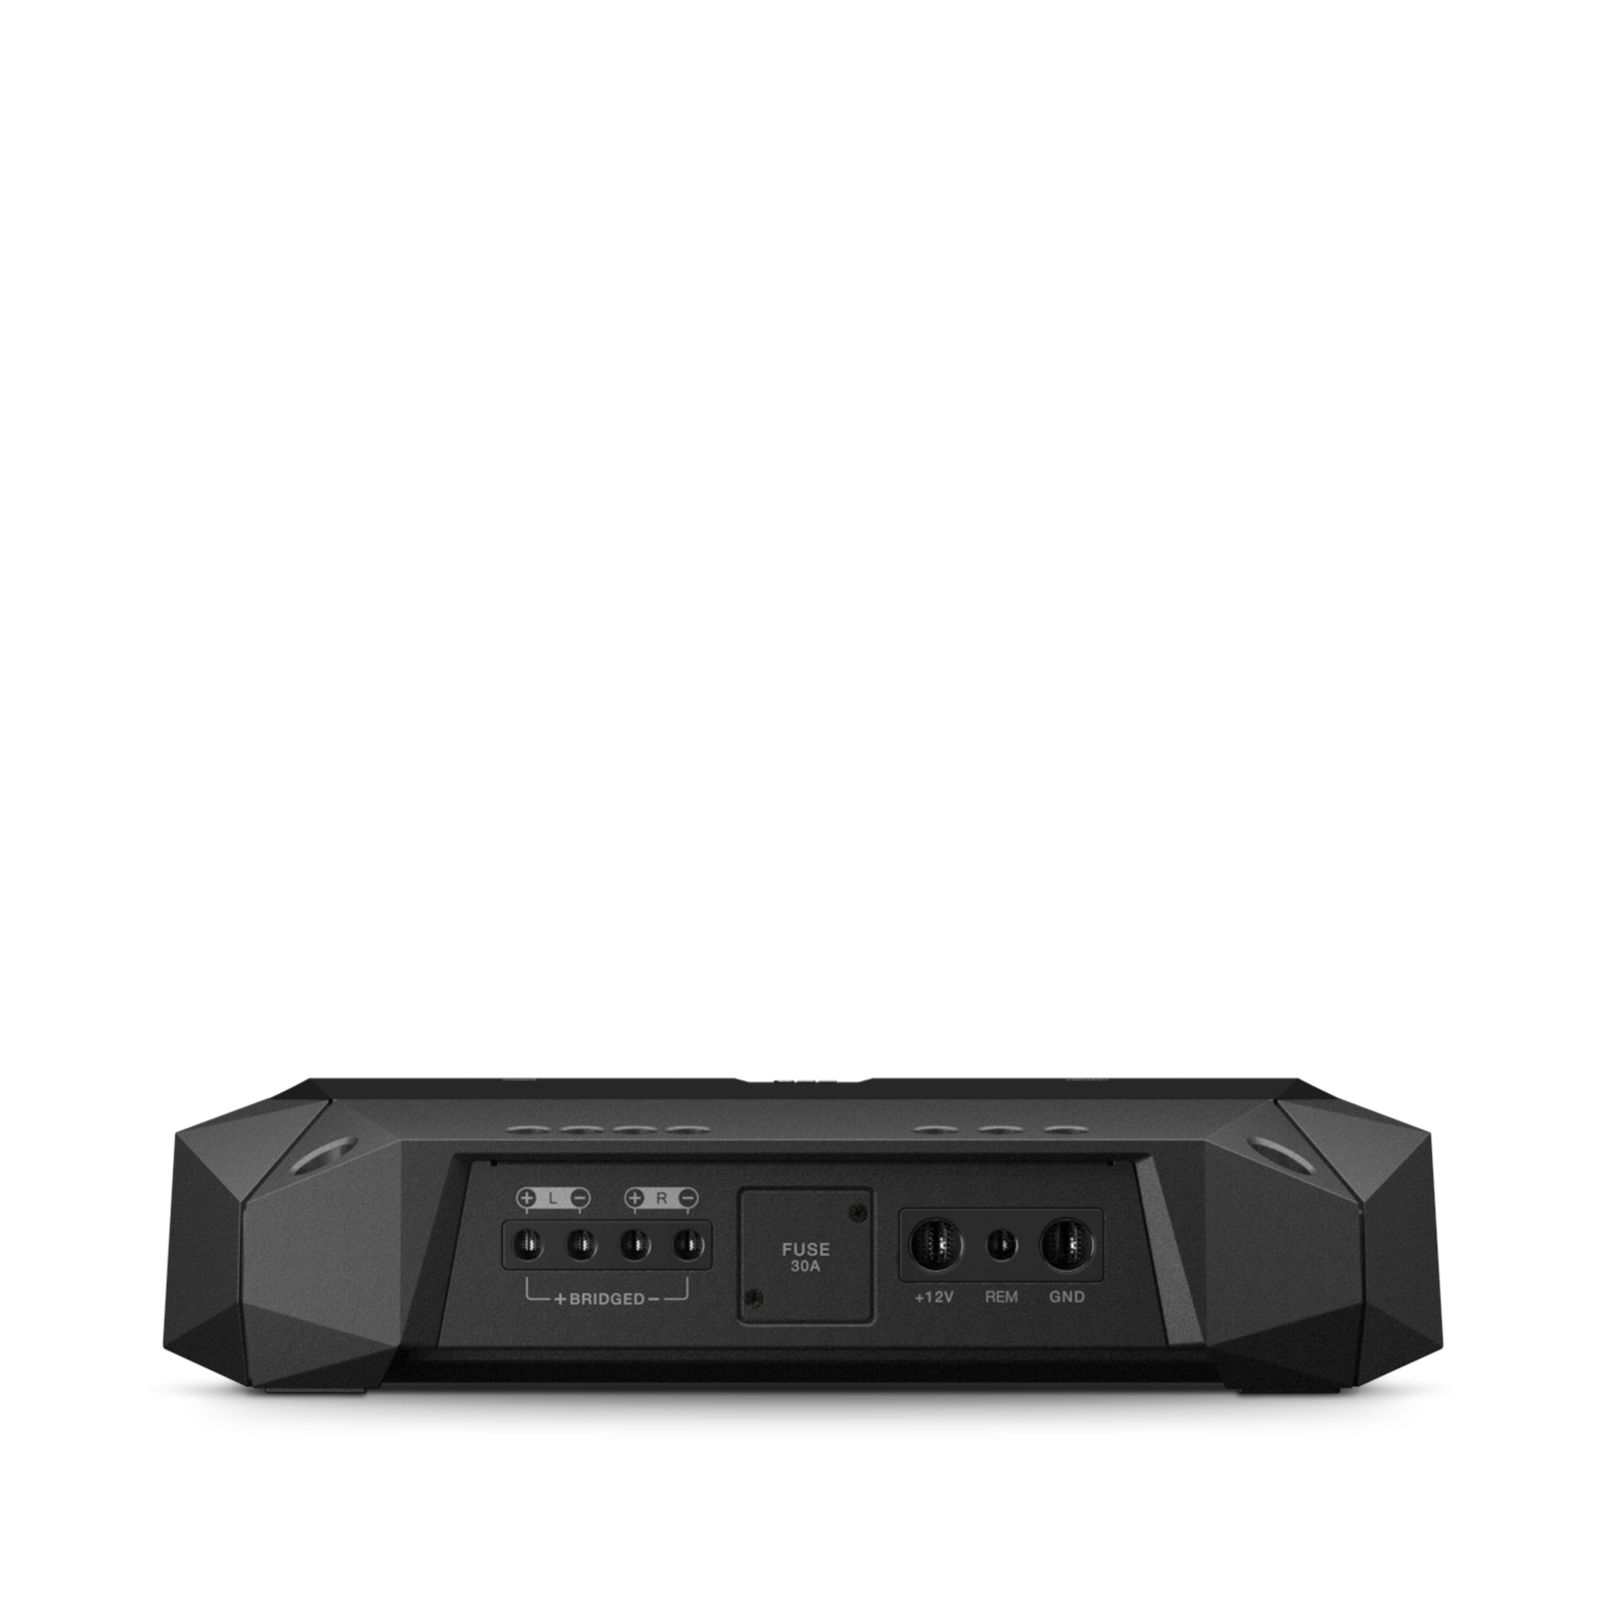 Club 5501 - Black - high-performance mono car amplifier - Front